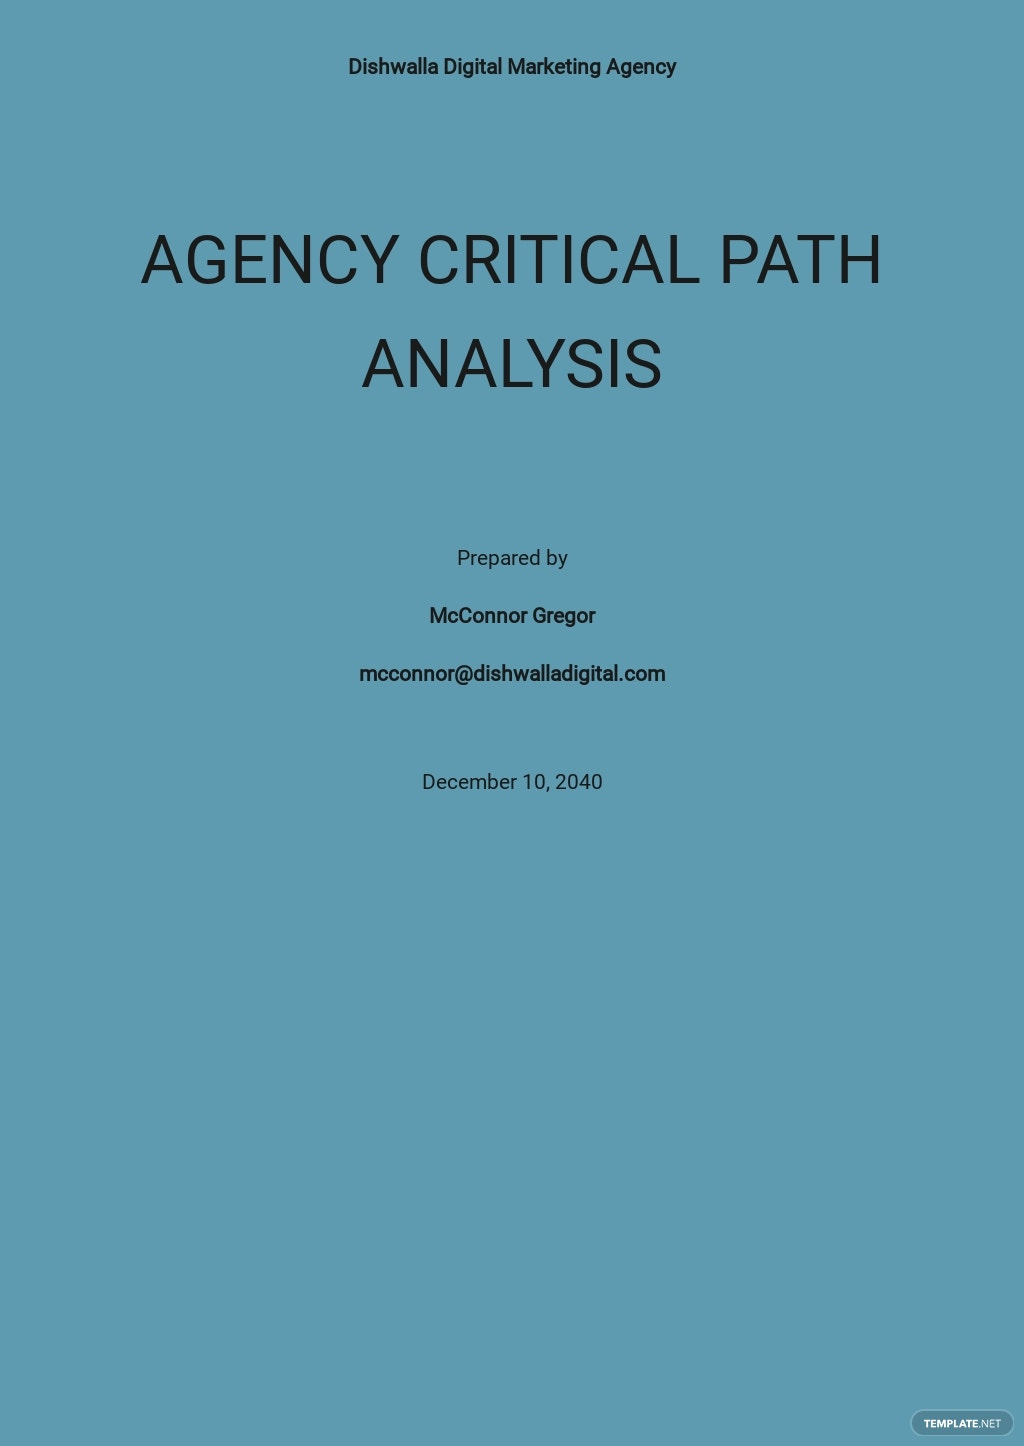 Agency Critical Path Analysis Template.jpe